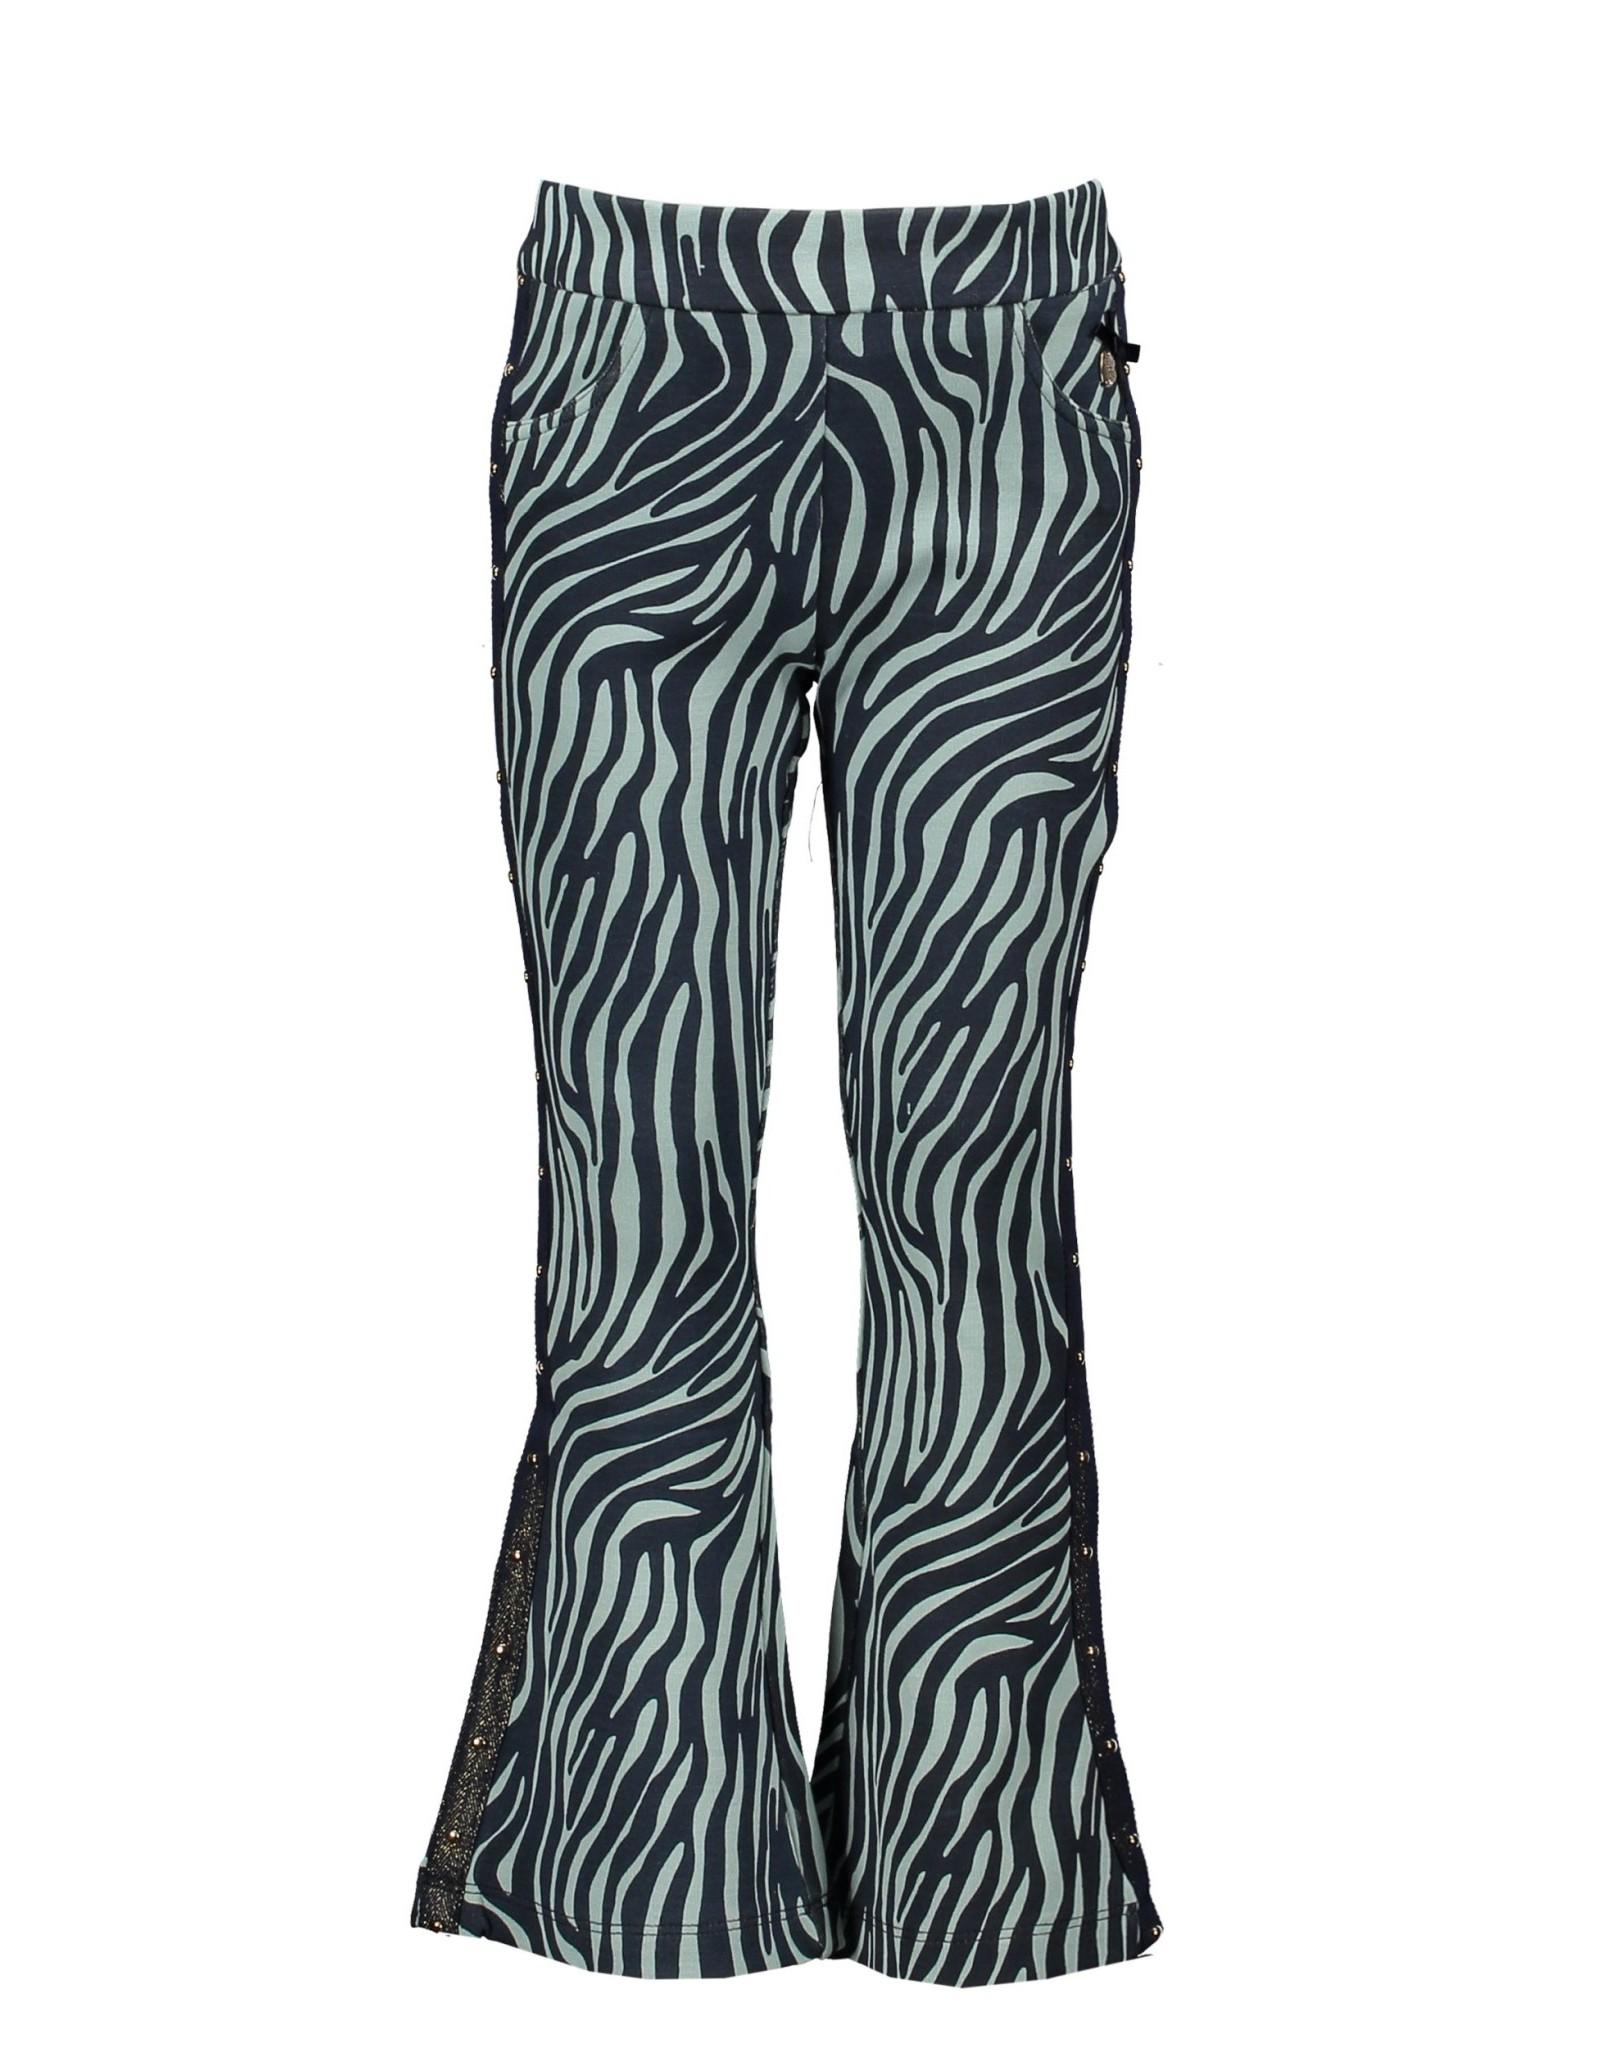 Le Chic broek zebra chic